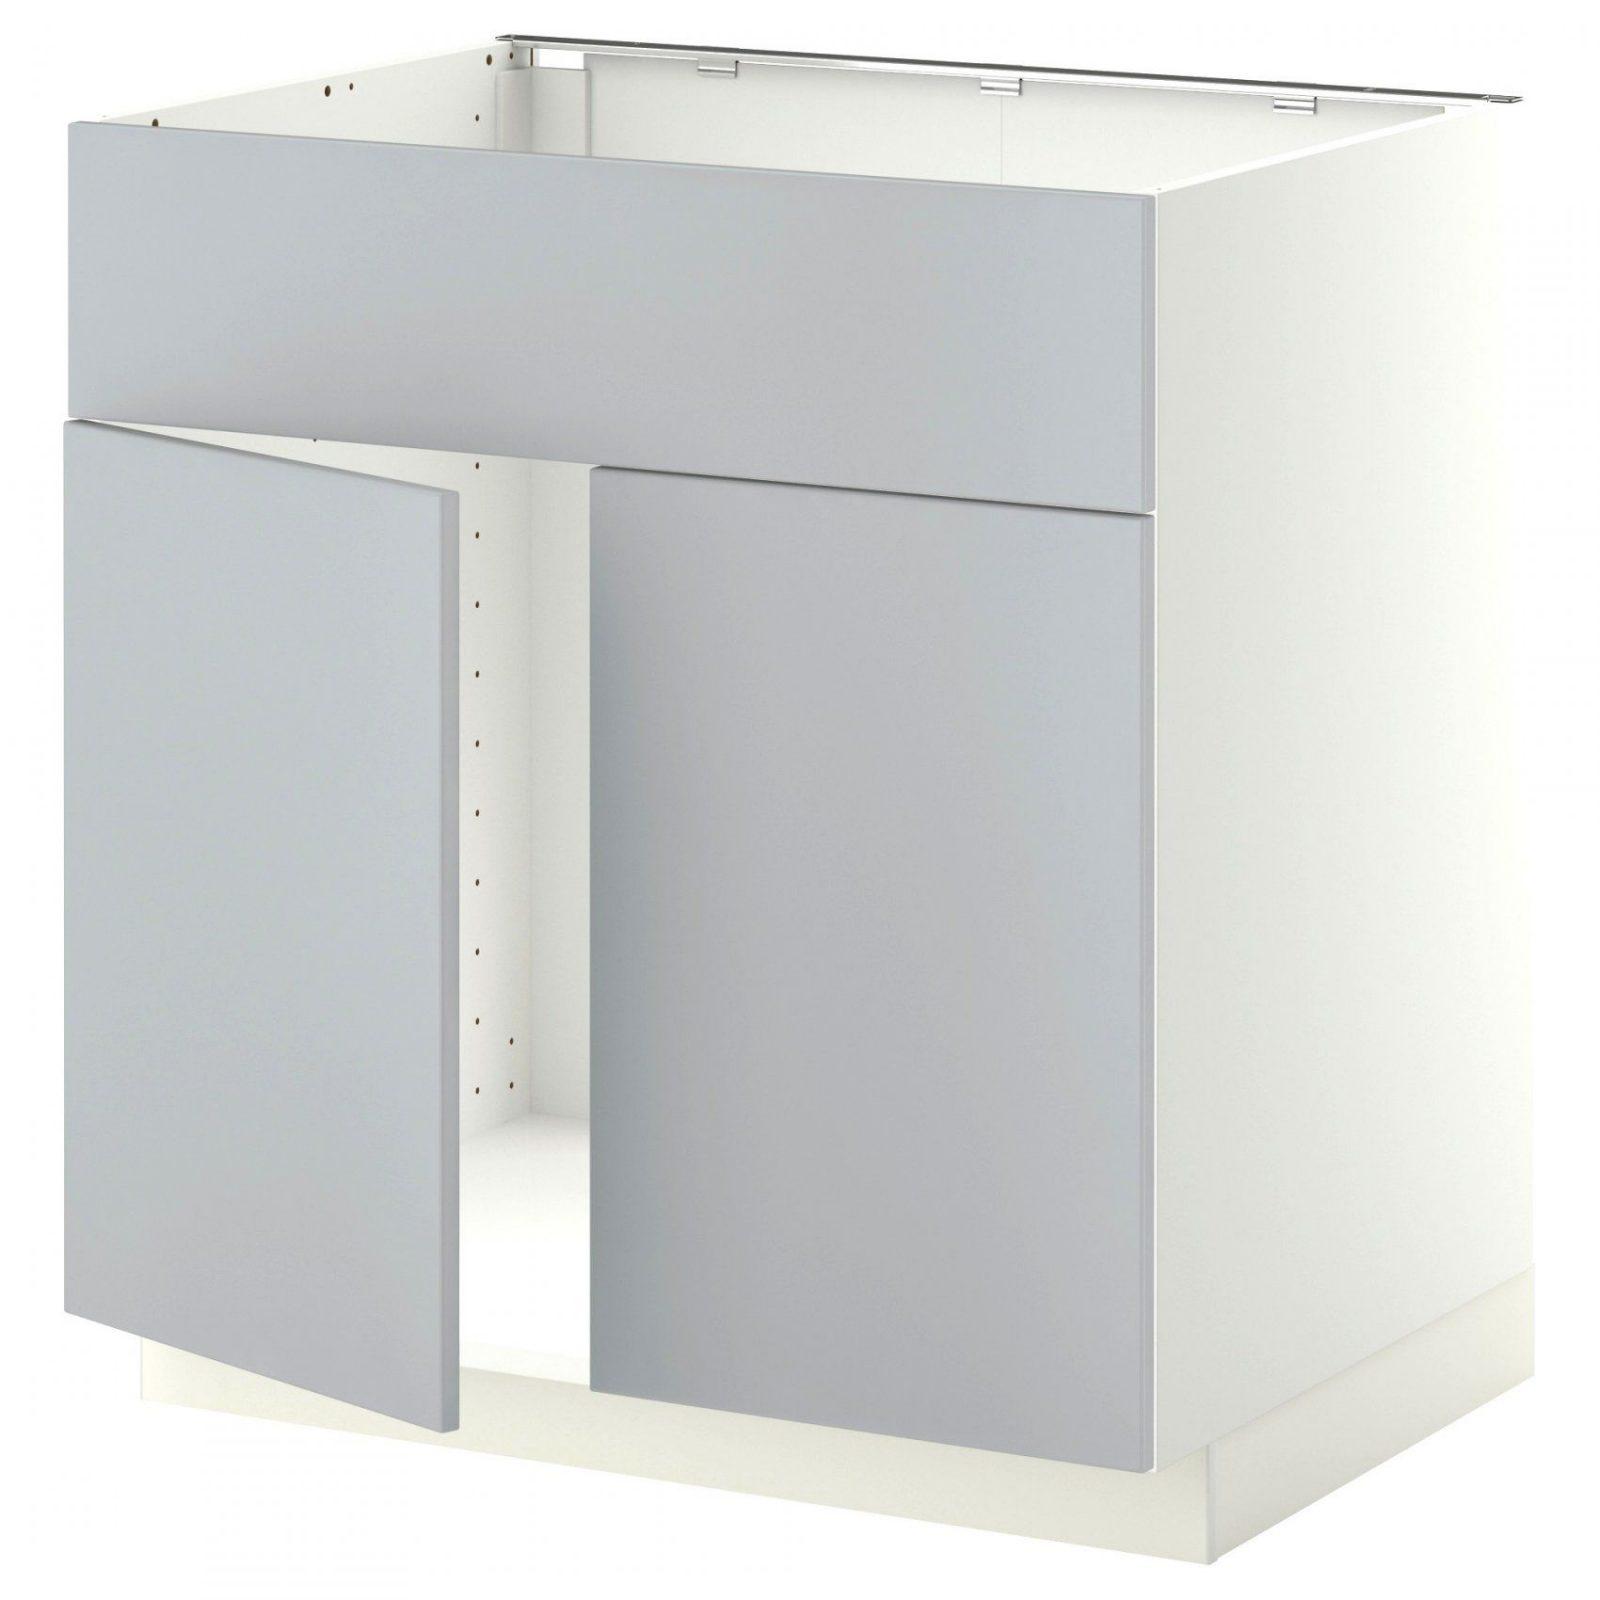 ikea keukenkast 50 cm breed in luxe pics van keuken